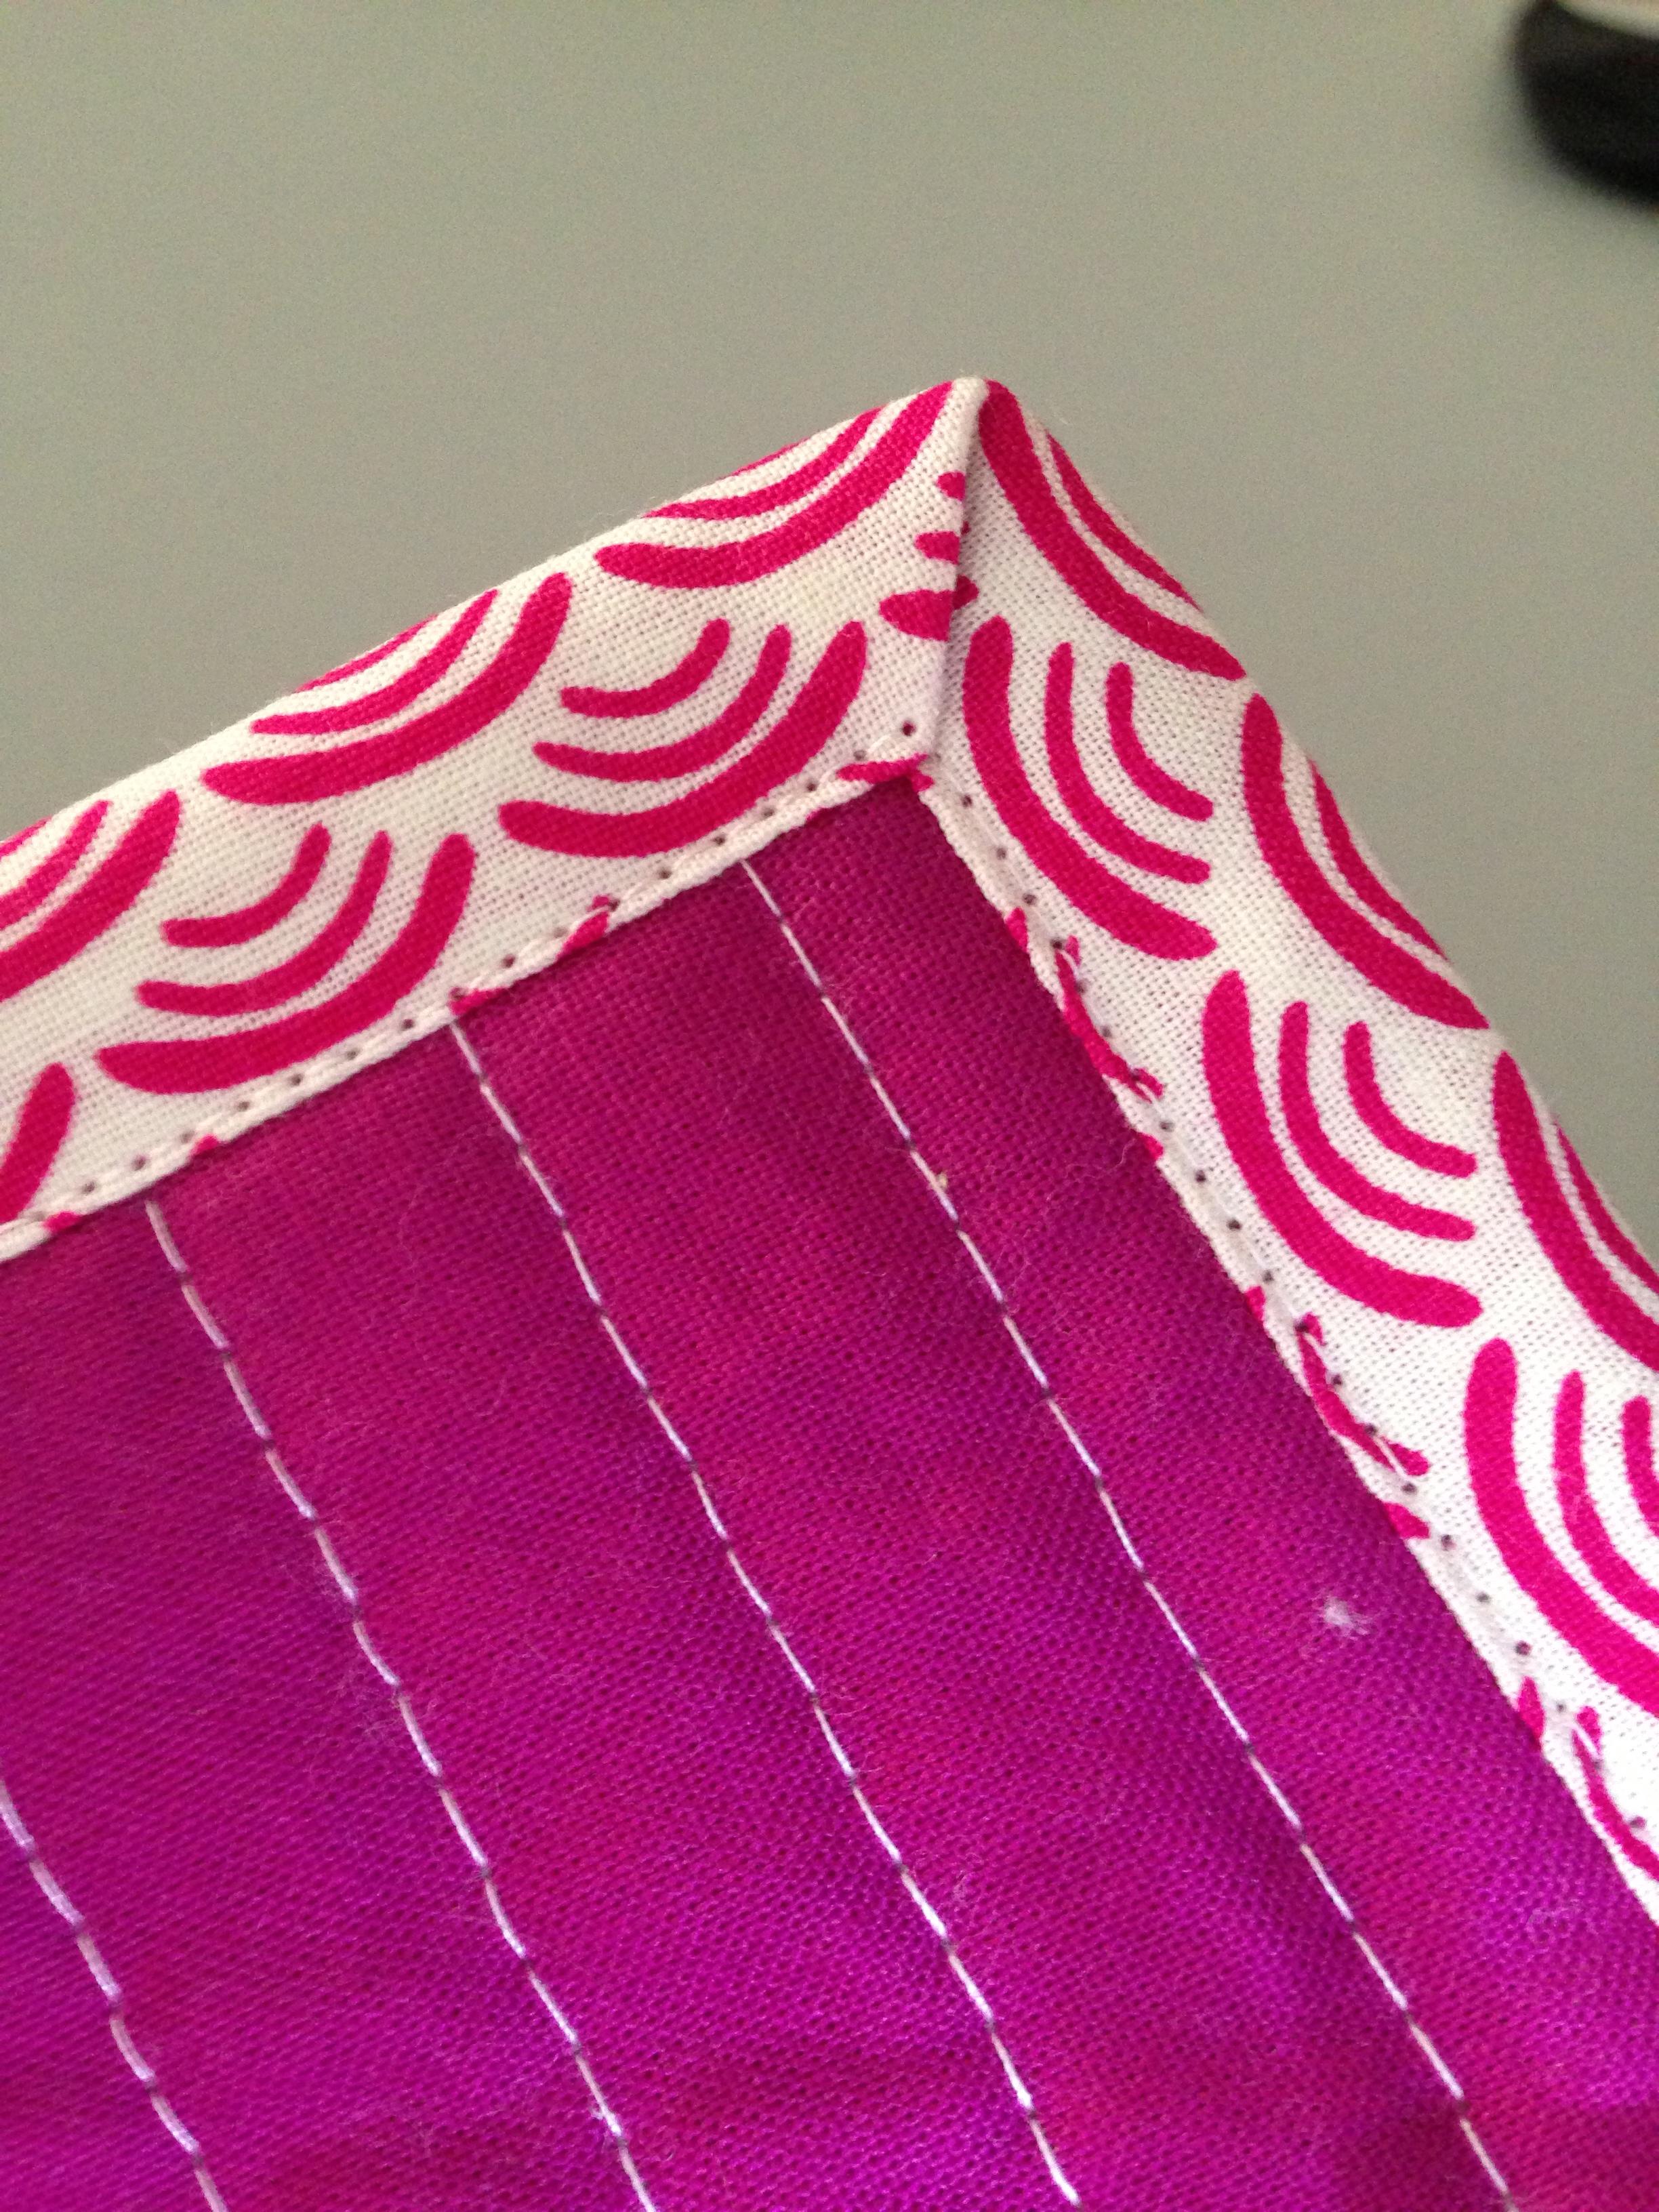 Quilting 101: Machine Binding | Wasn't Quilt in a Day : how to machine bind a quilt - Adamdwight.com